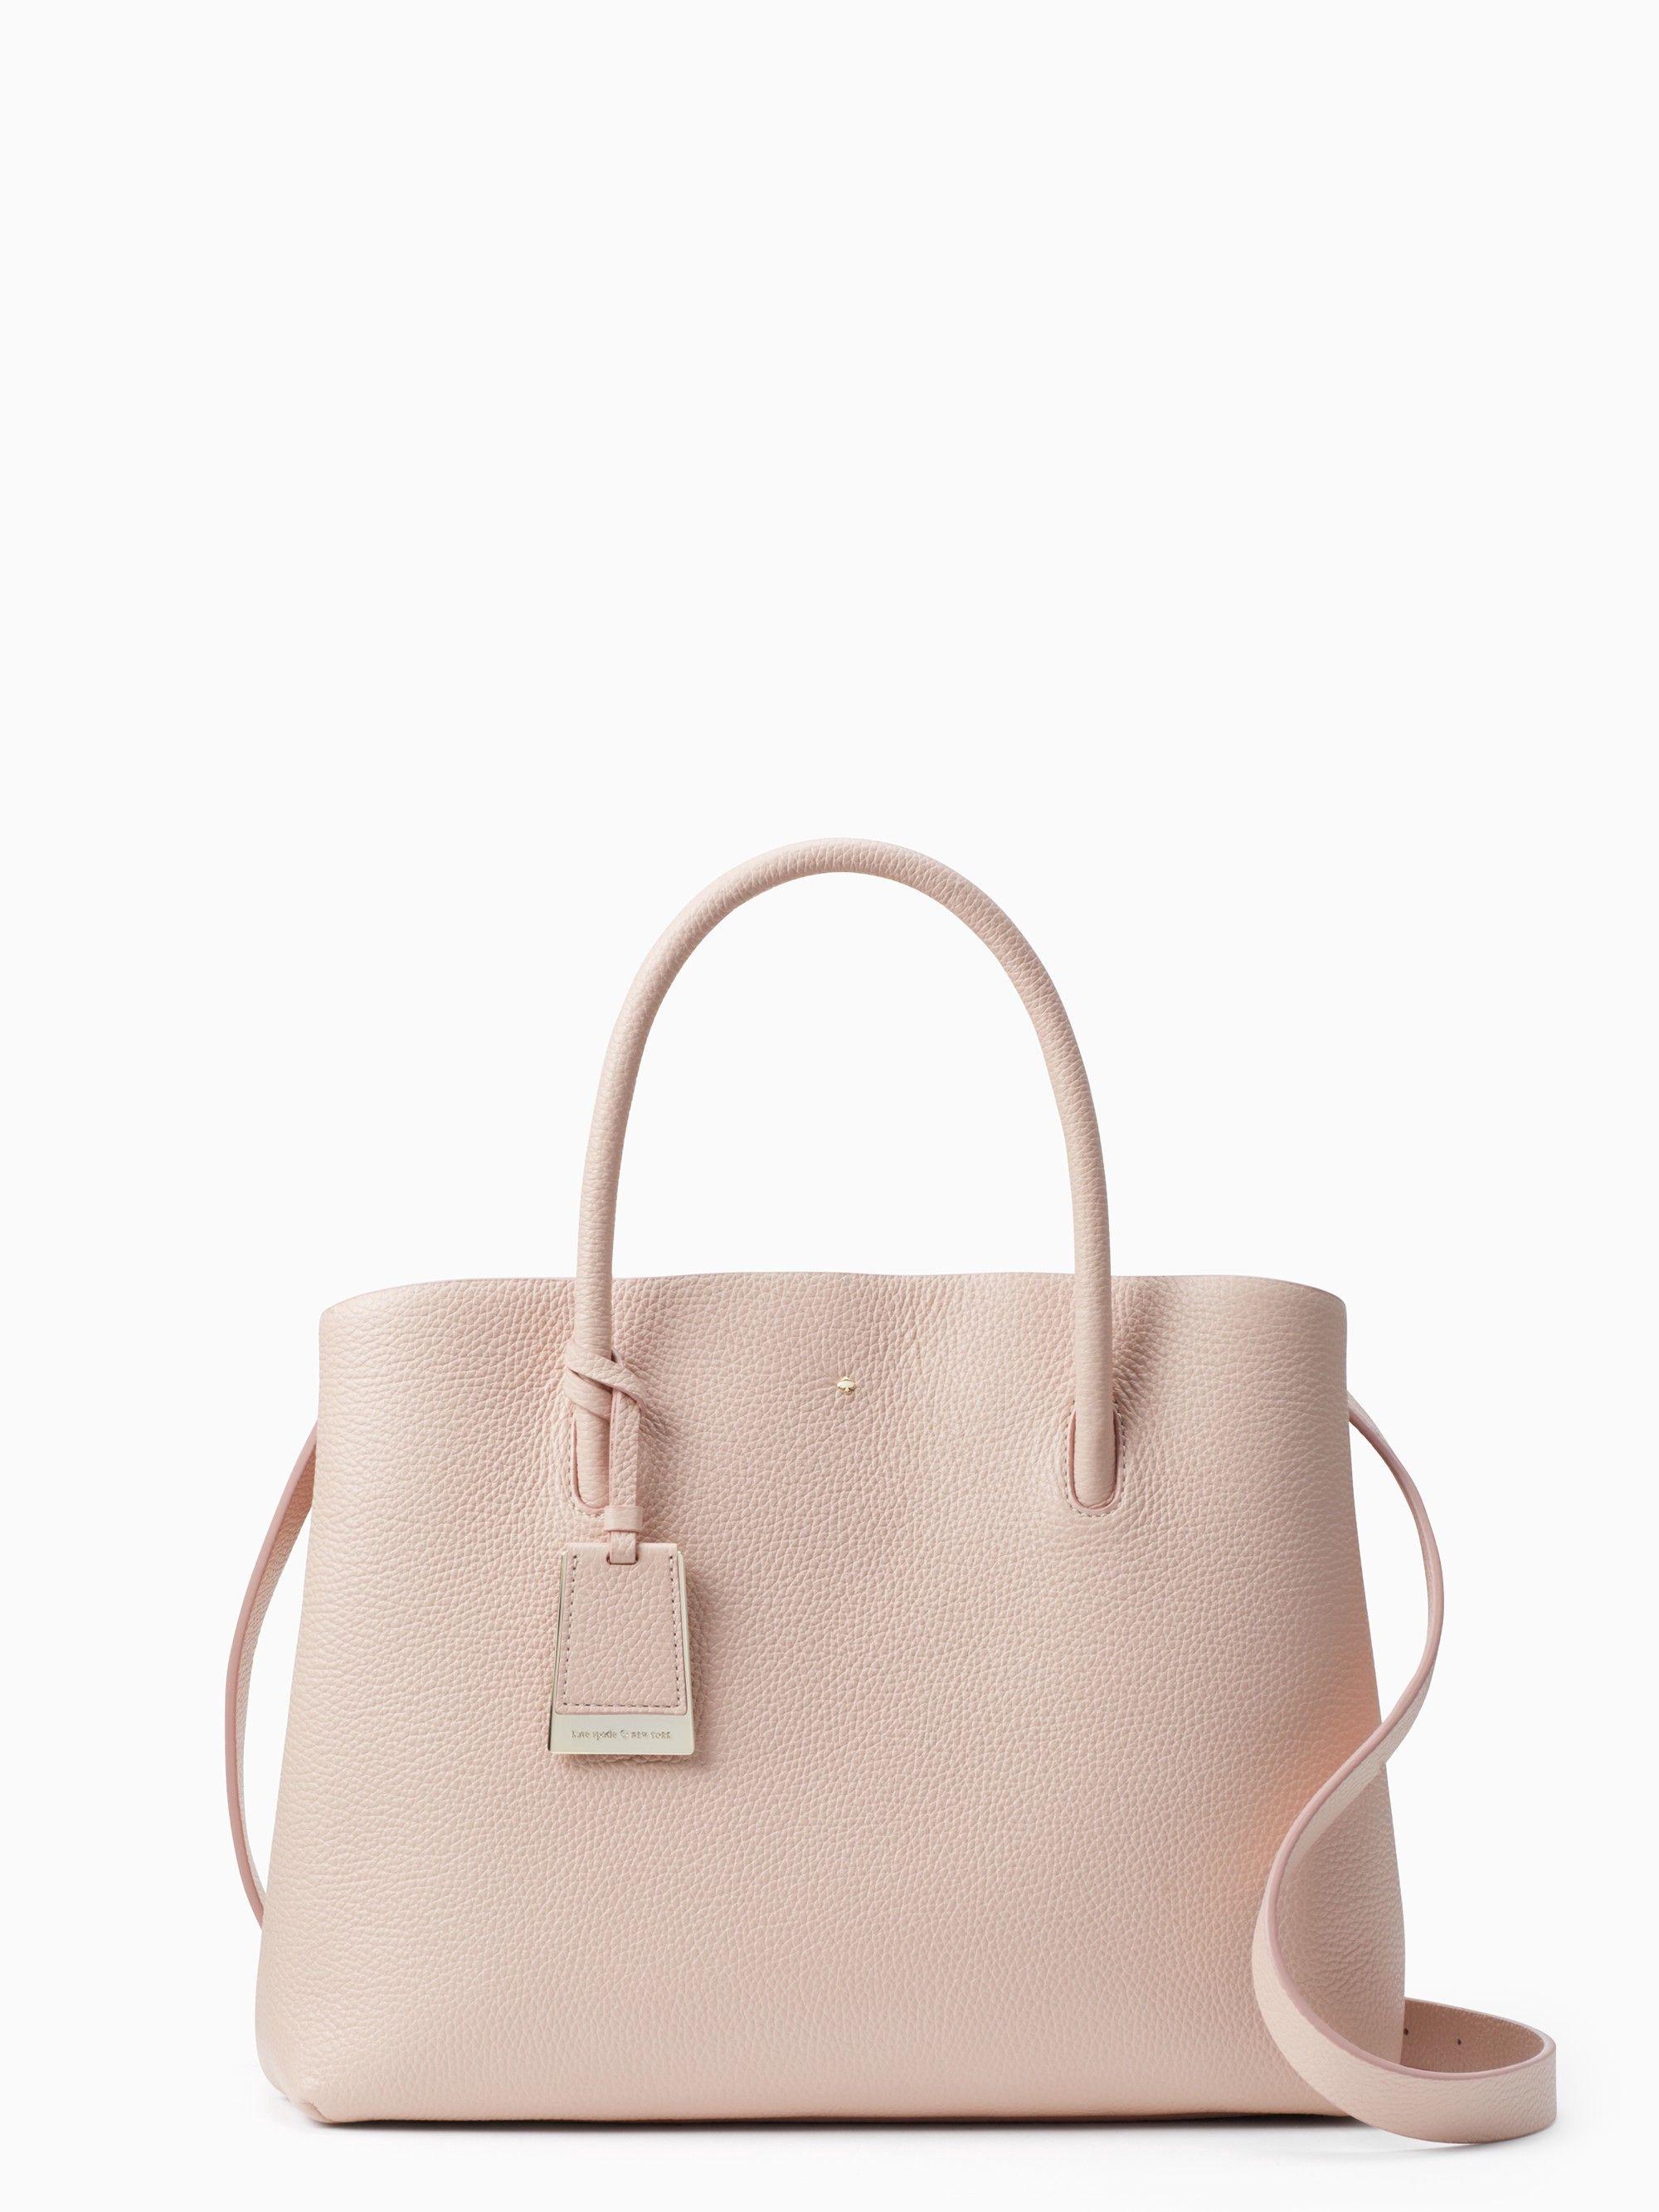 Kate Spade Knollwood Drive Large Celestina Katespade Bags Leather Hand Satchel Lining